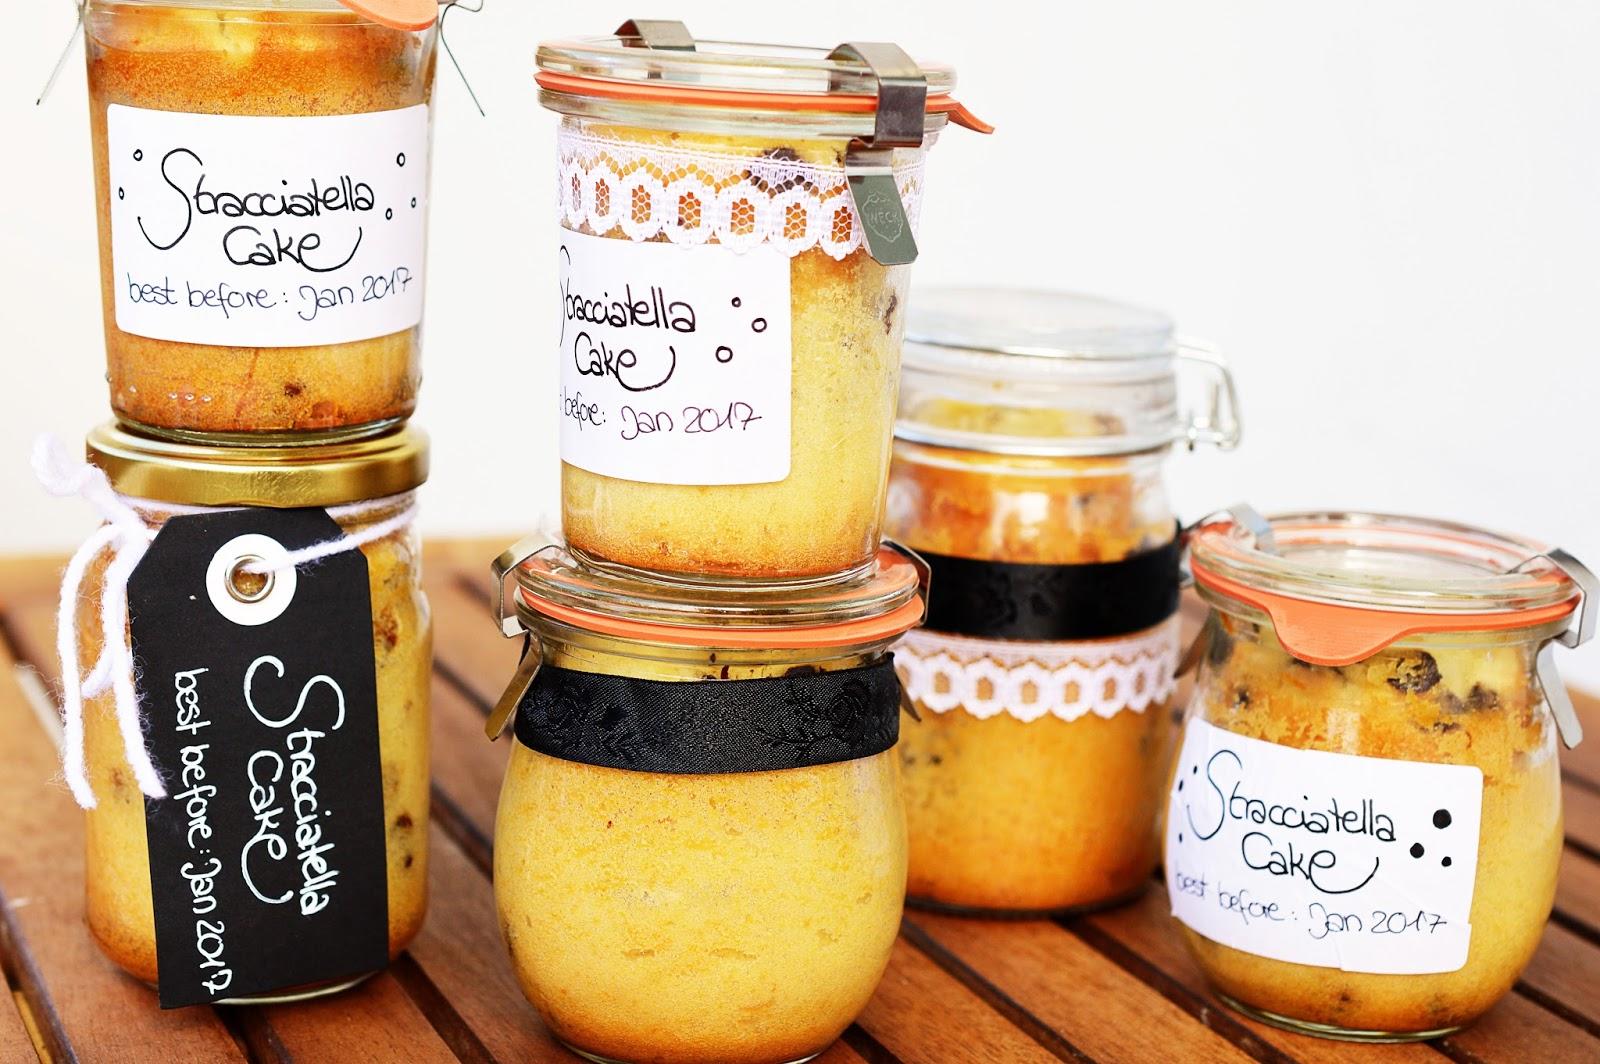 Stracciatella Cake in a Jar, Motte's Blog